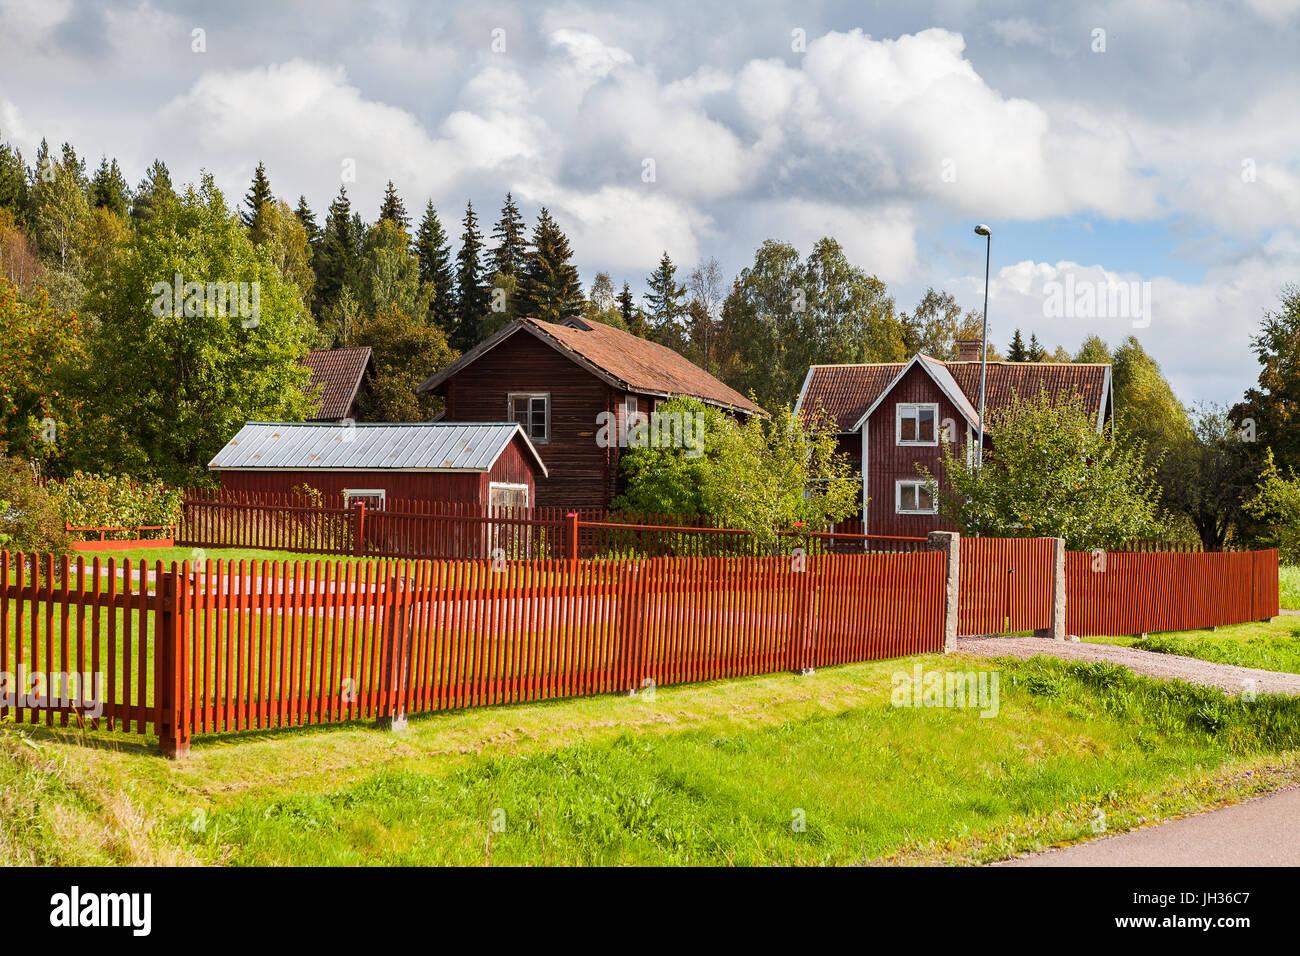 Typical scandinavian wooden houses in village. Dalarna county, Sweden. - Stock Image